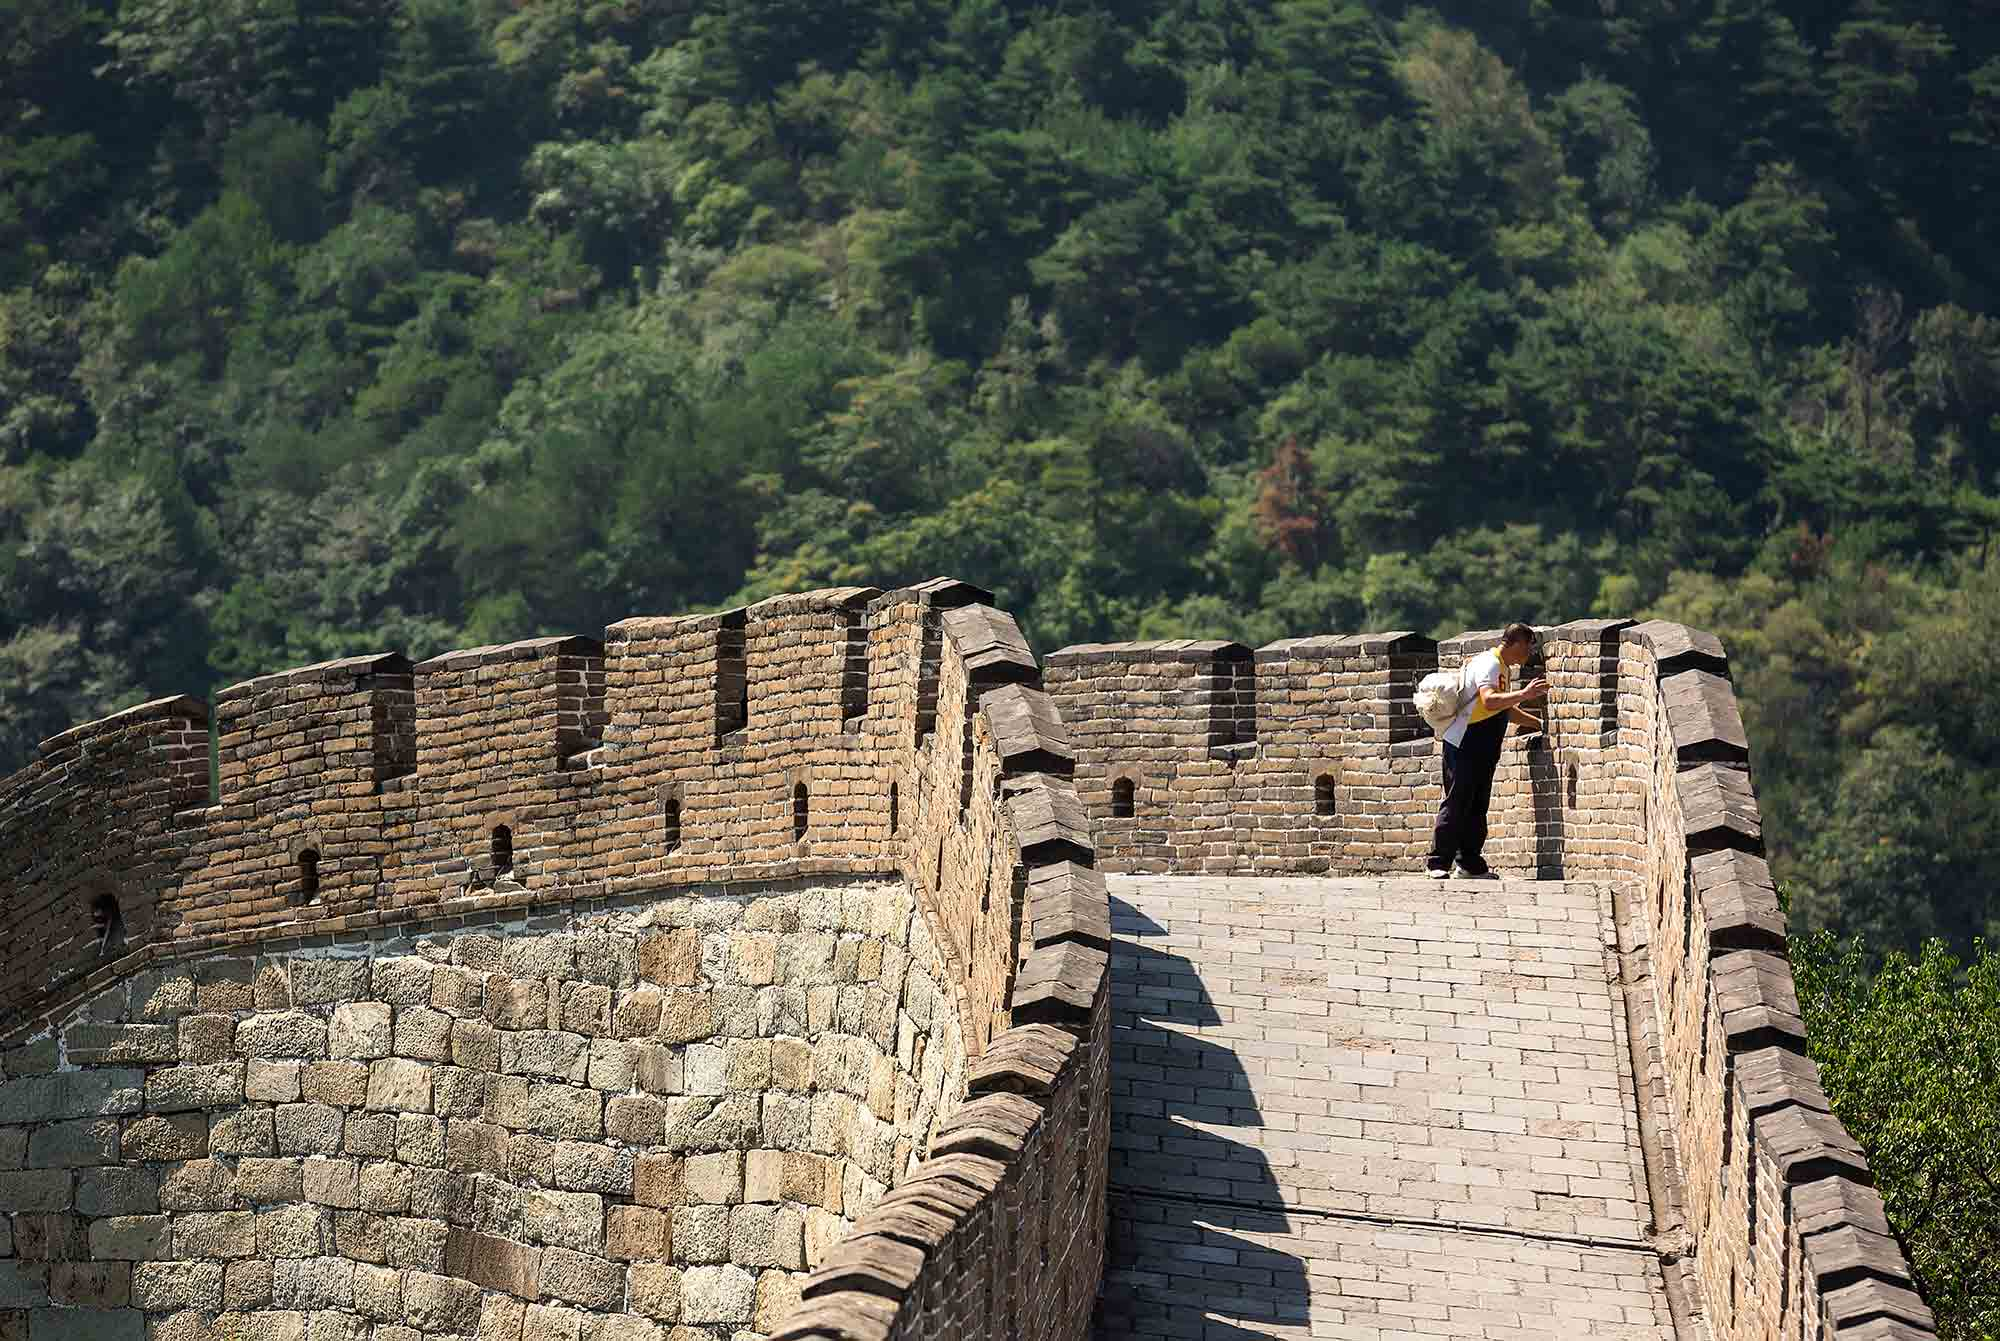 The Great Wall of China near Beijing. © Ulli Maier & Nisa Maier